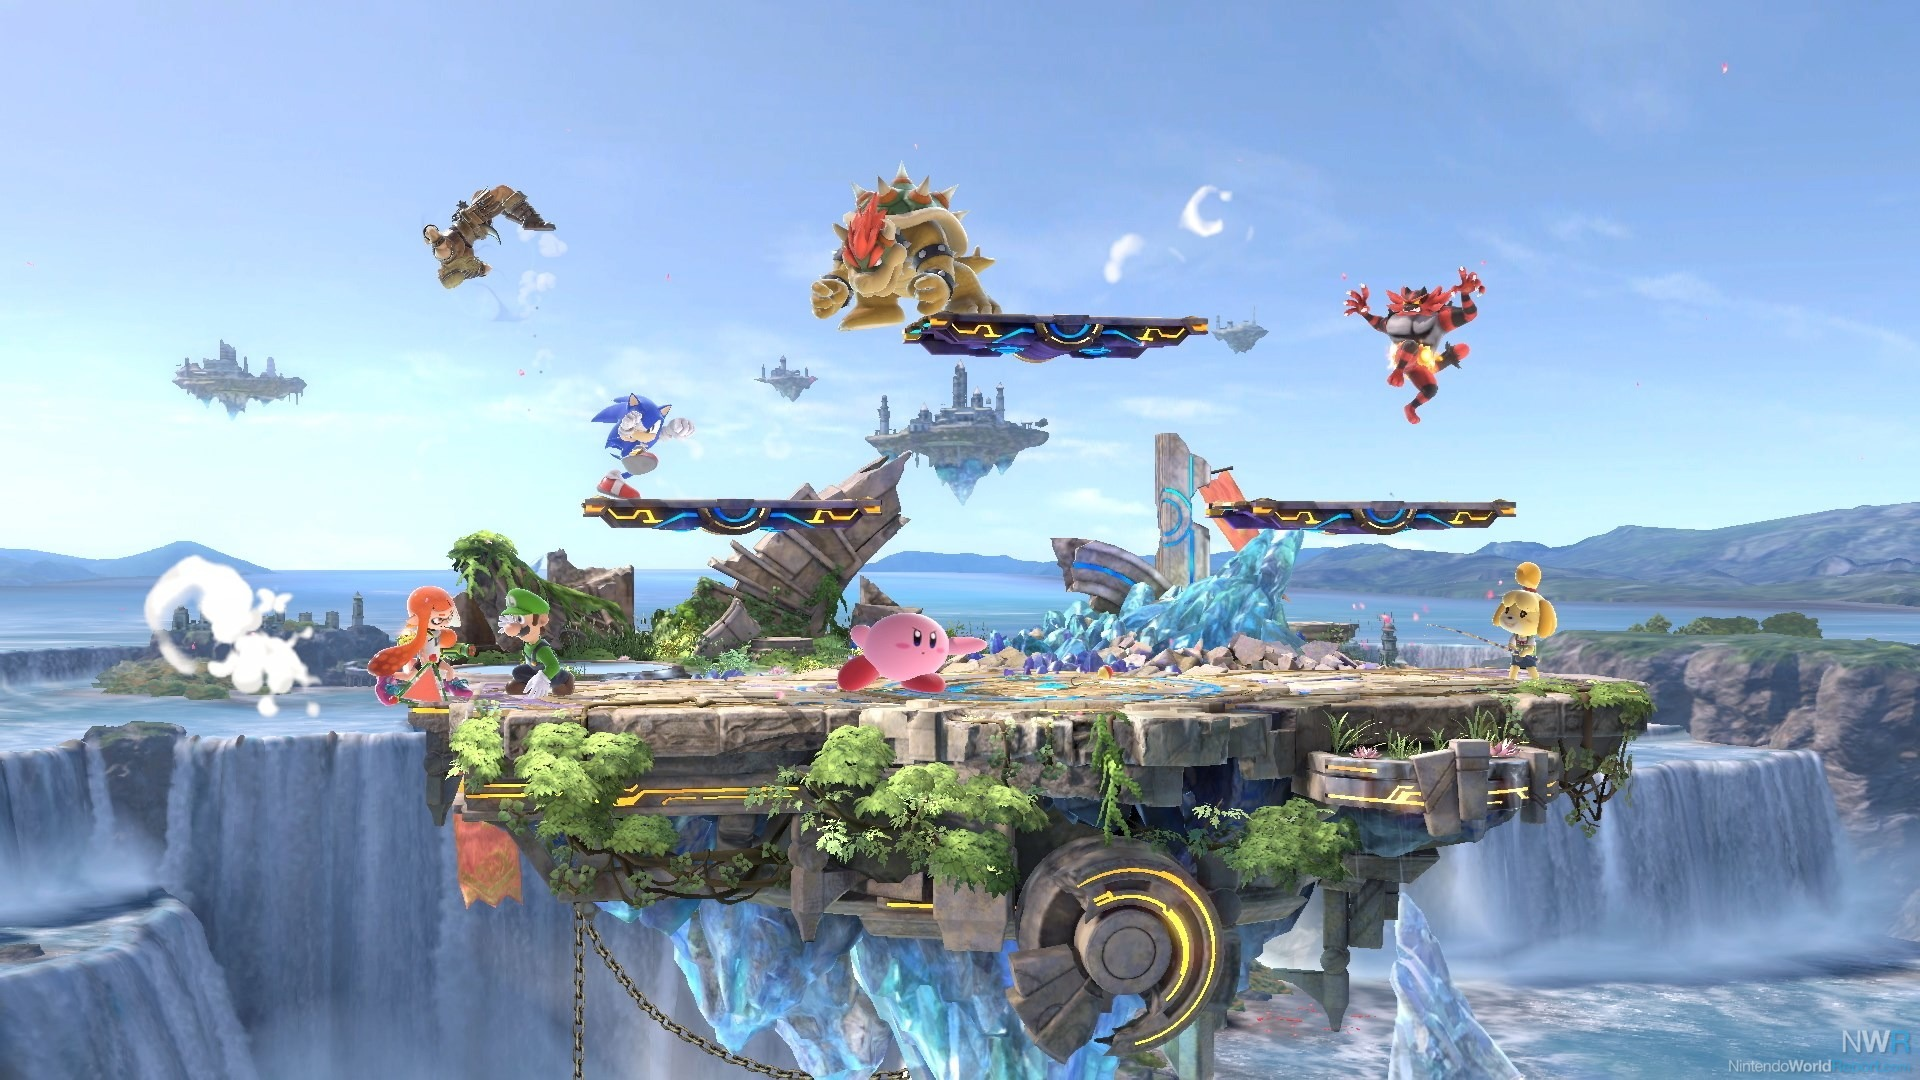 Nintendo Announces Smash, Splatoon 2 World Championships For June In Los Angeles